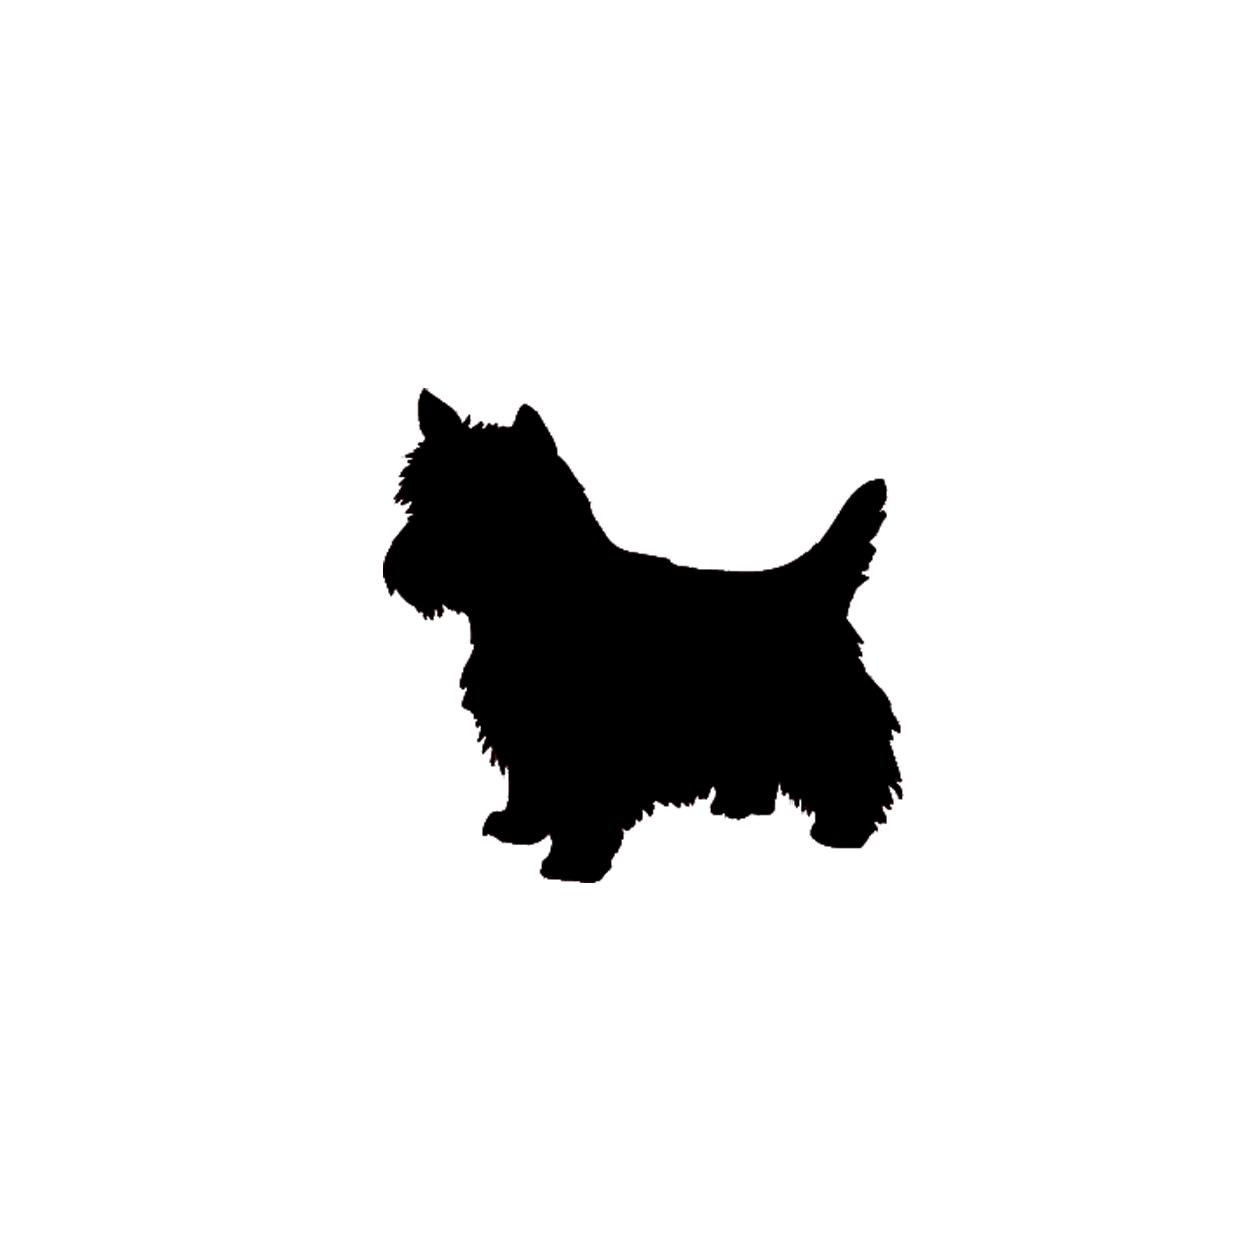 1260x1260 Free SVG File Download – Yorkie Dog Silhouette – BeaOriginal